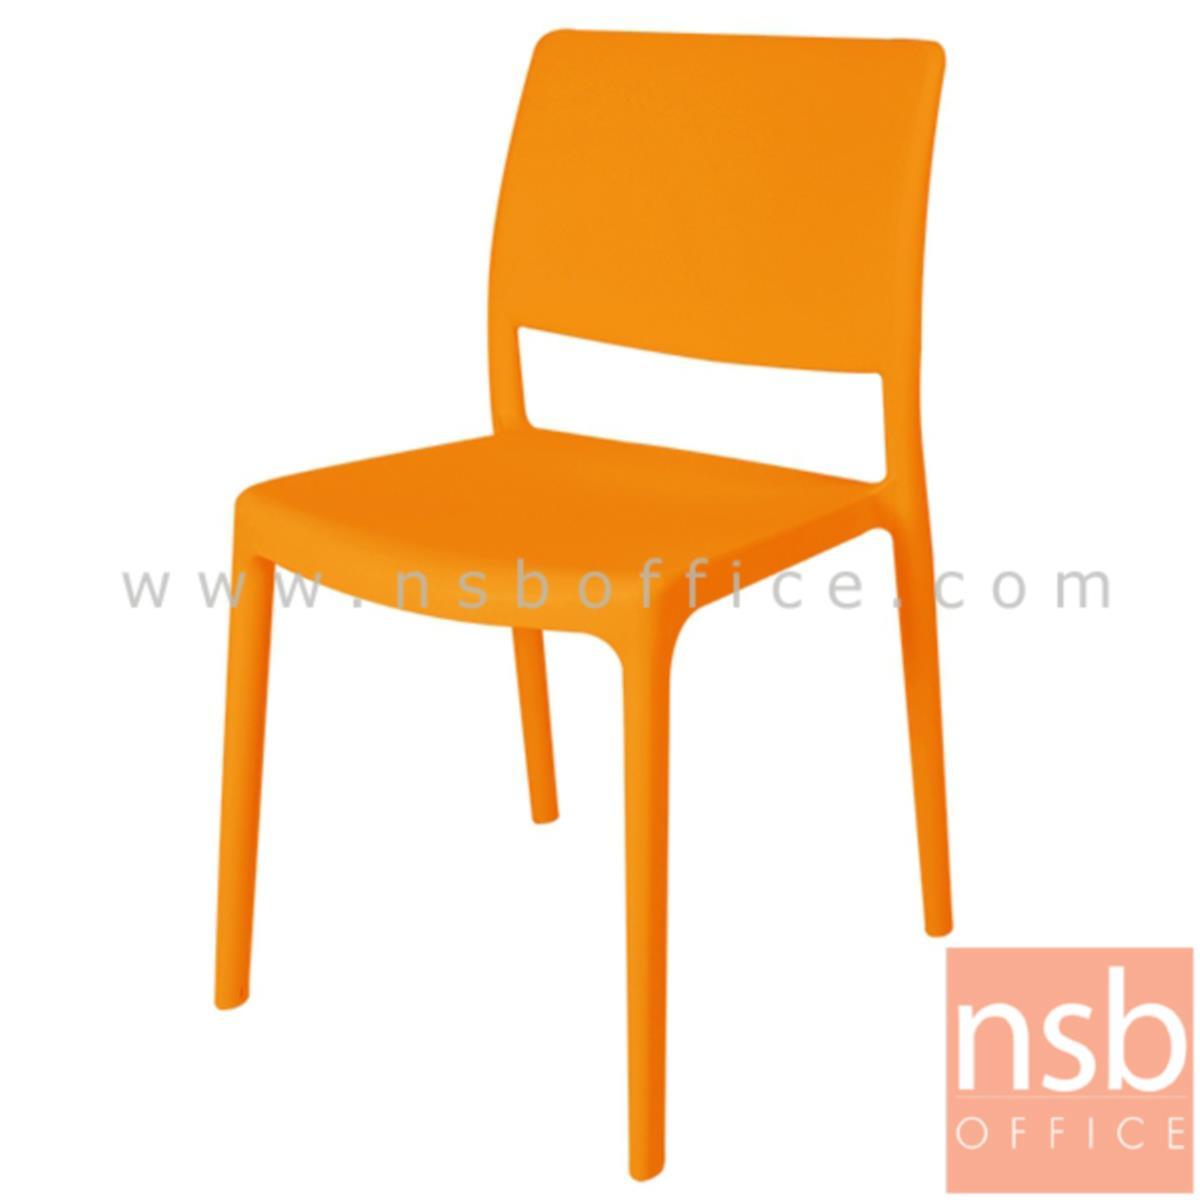 B29A174:เก้าอี้โมเดิร์นพลาสติก รุ่น PI-NG75 ขนาด 46W cm.